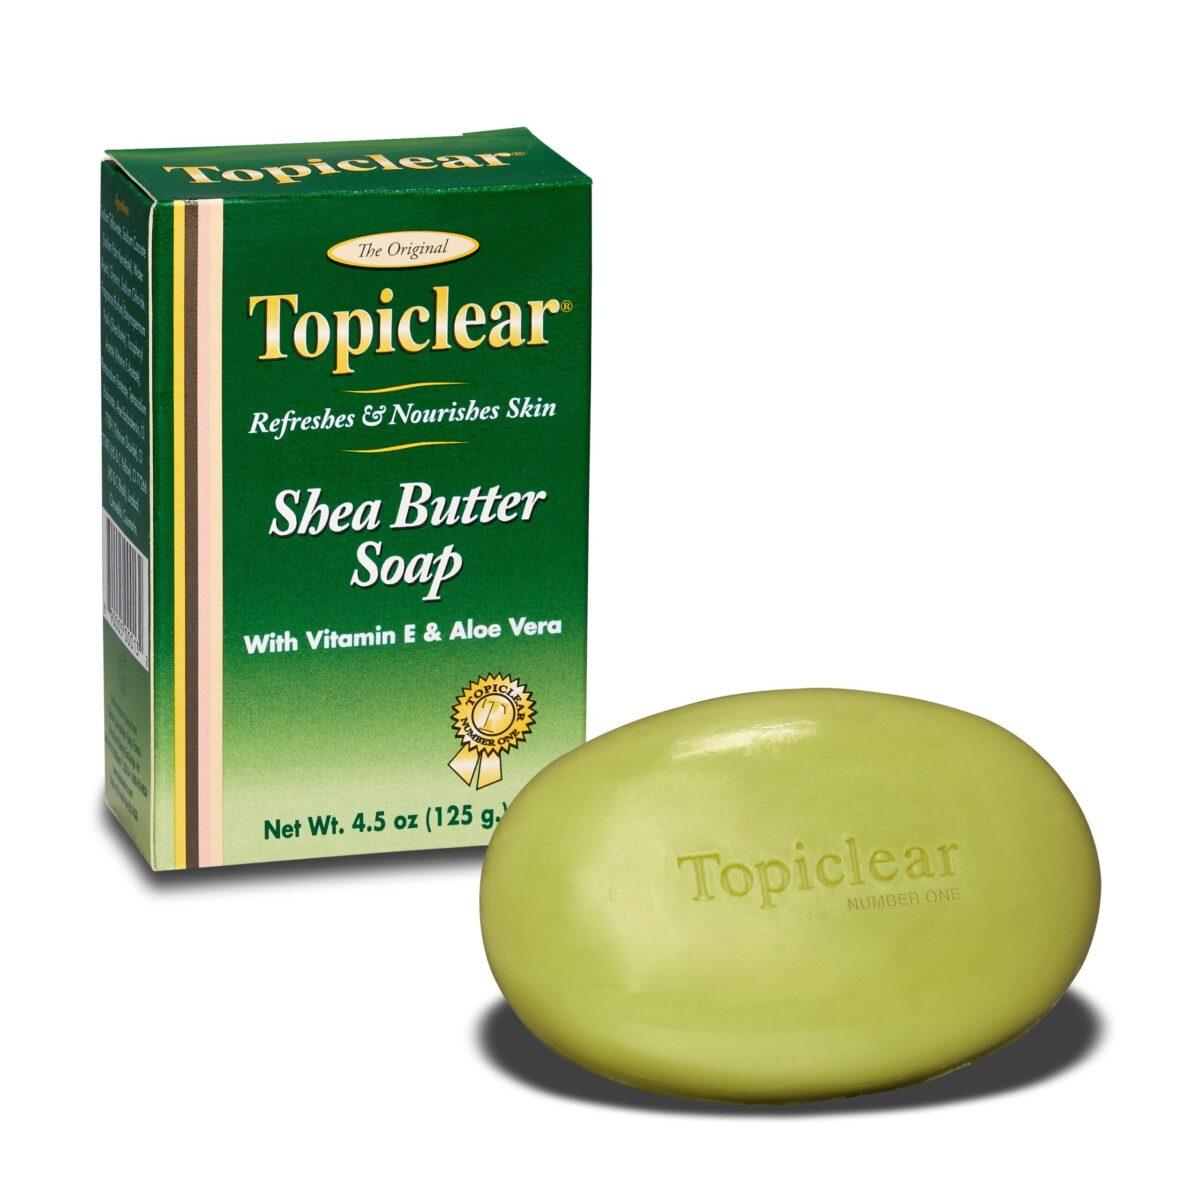 Buy Topiclear Gold Shea Butter Soap